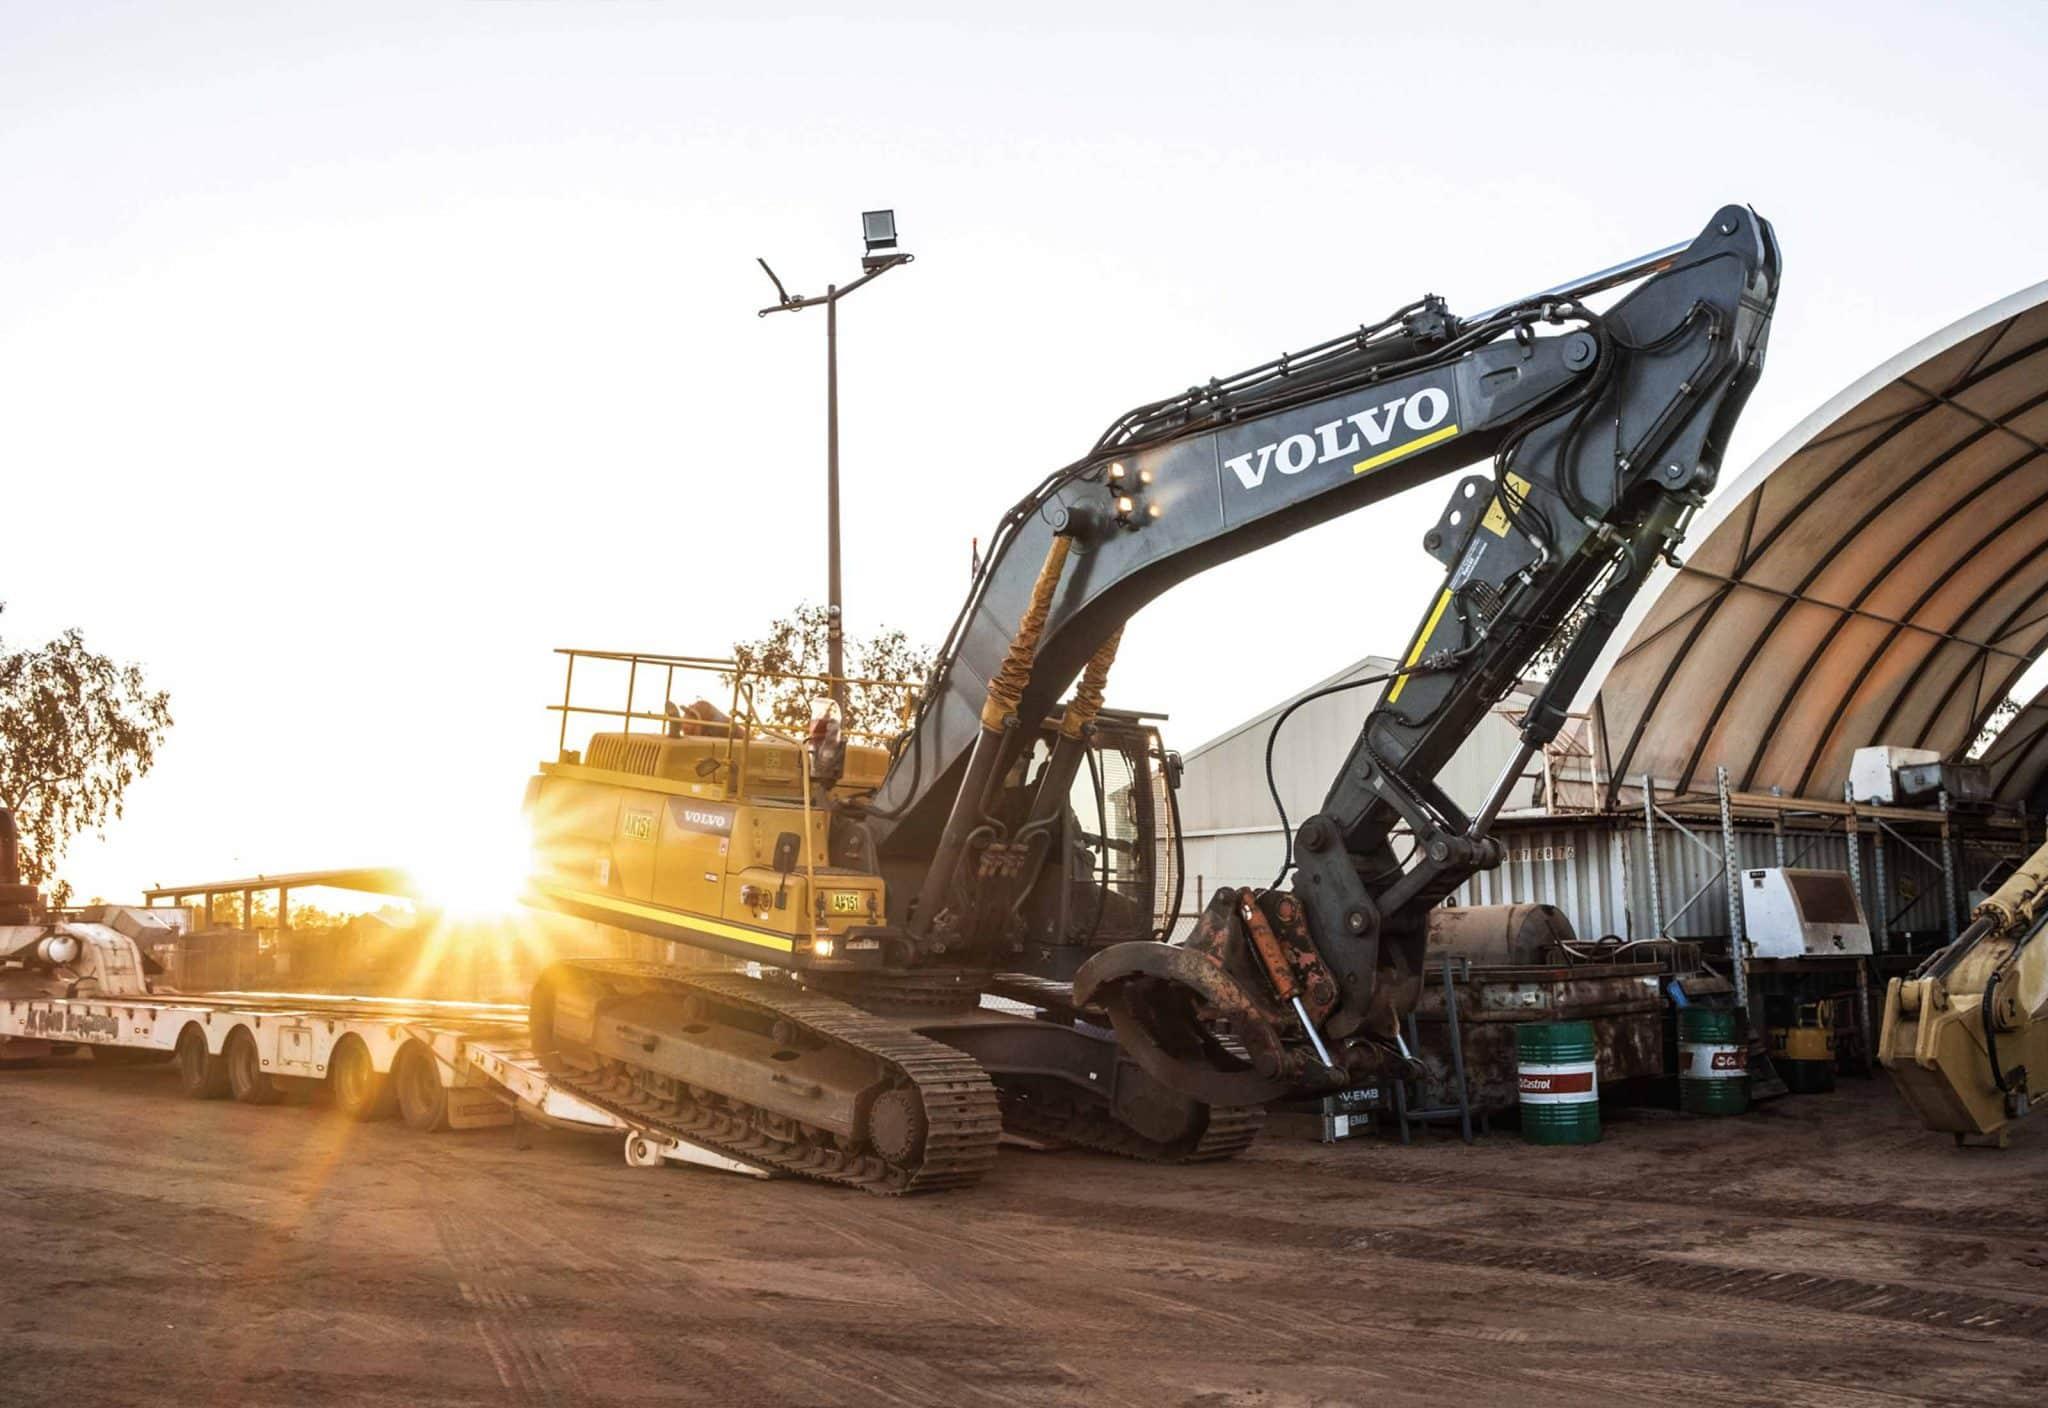 10 4S Work AK Evans Excavator